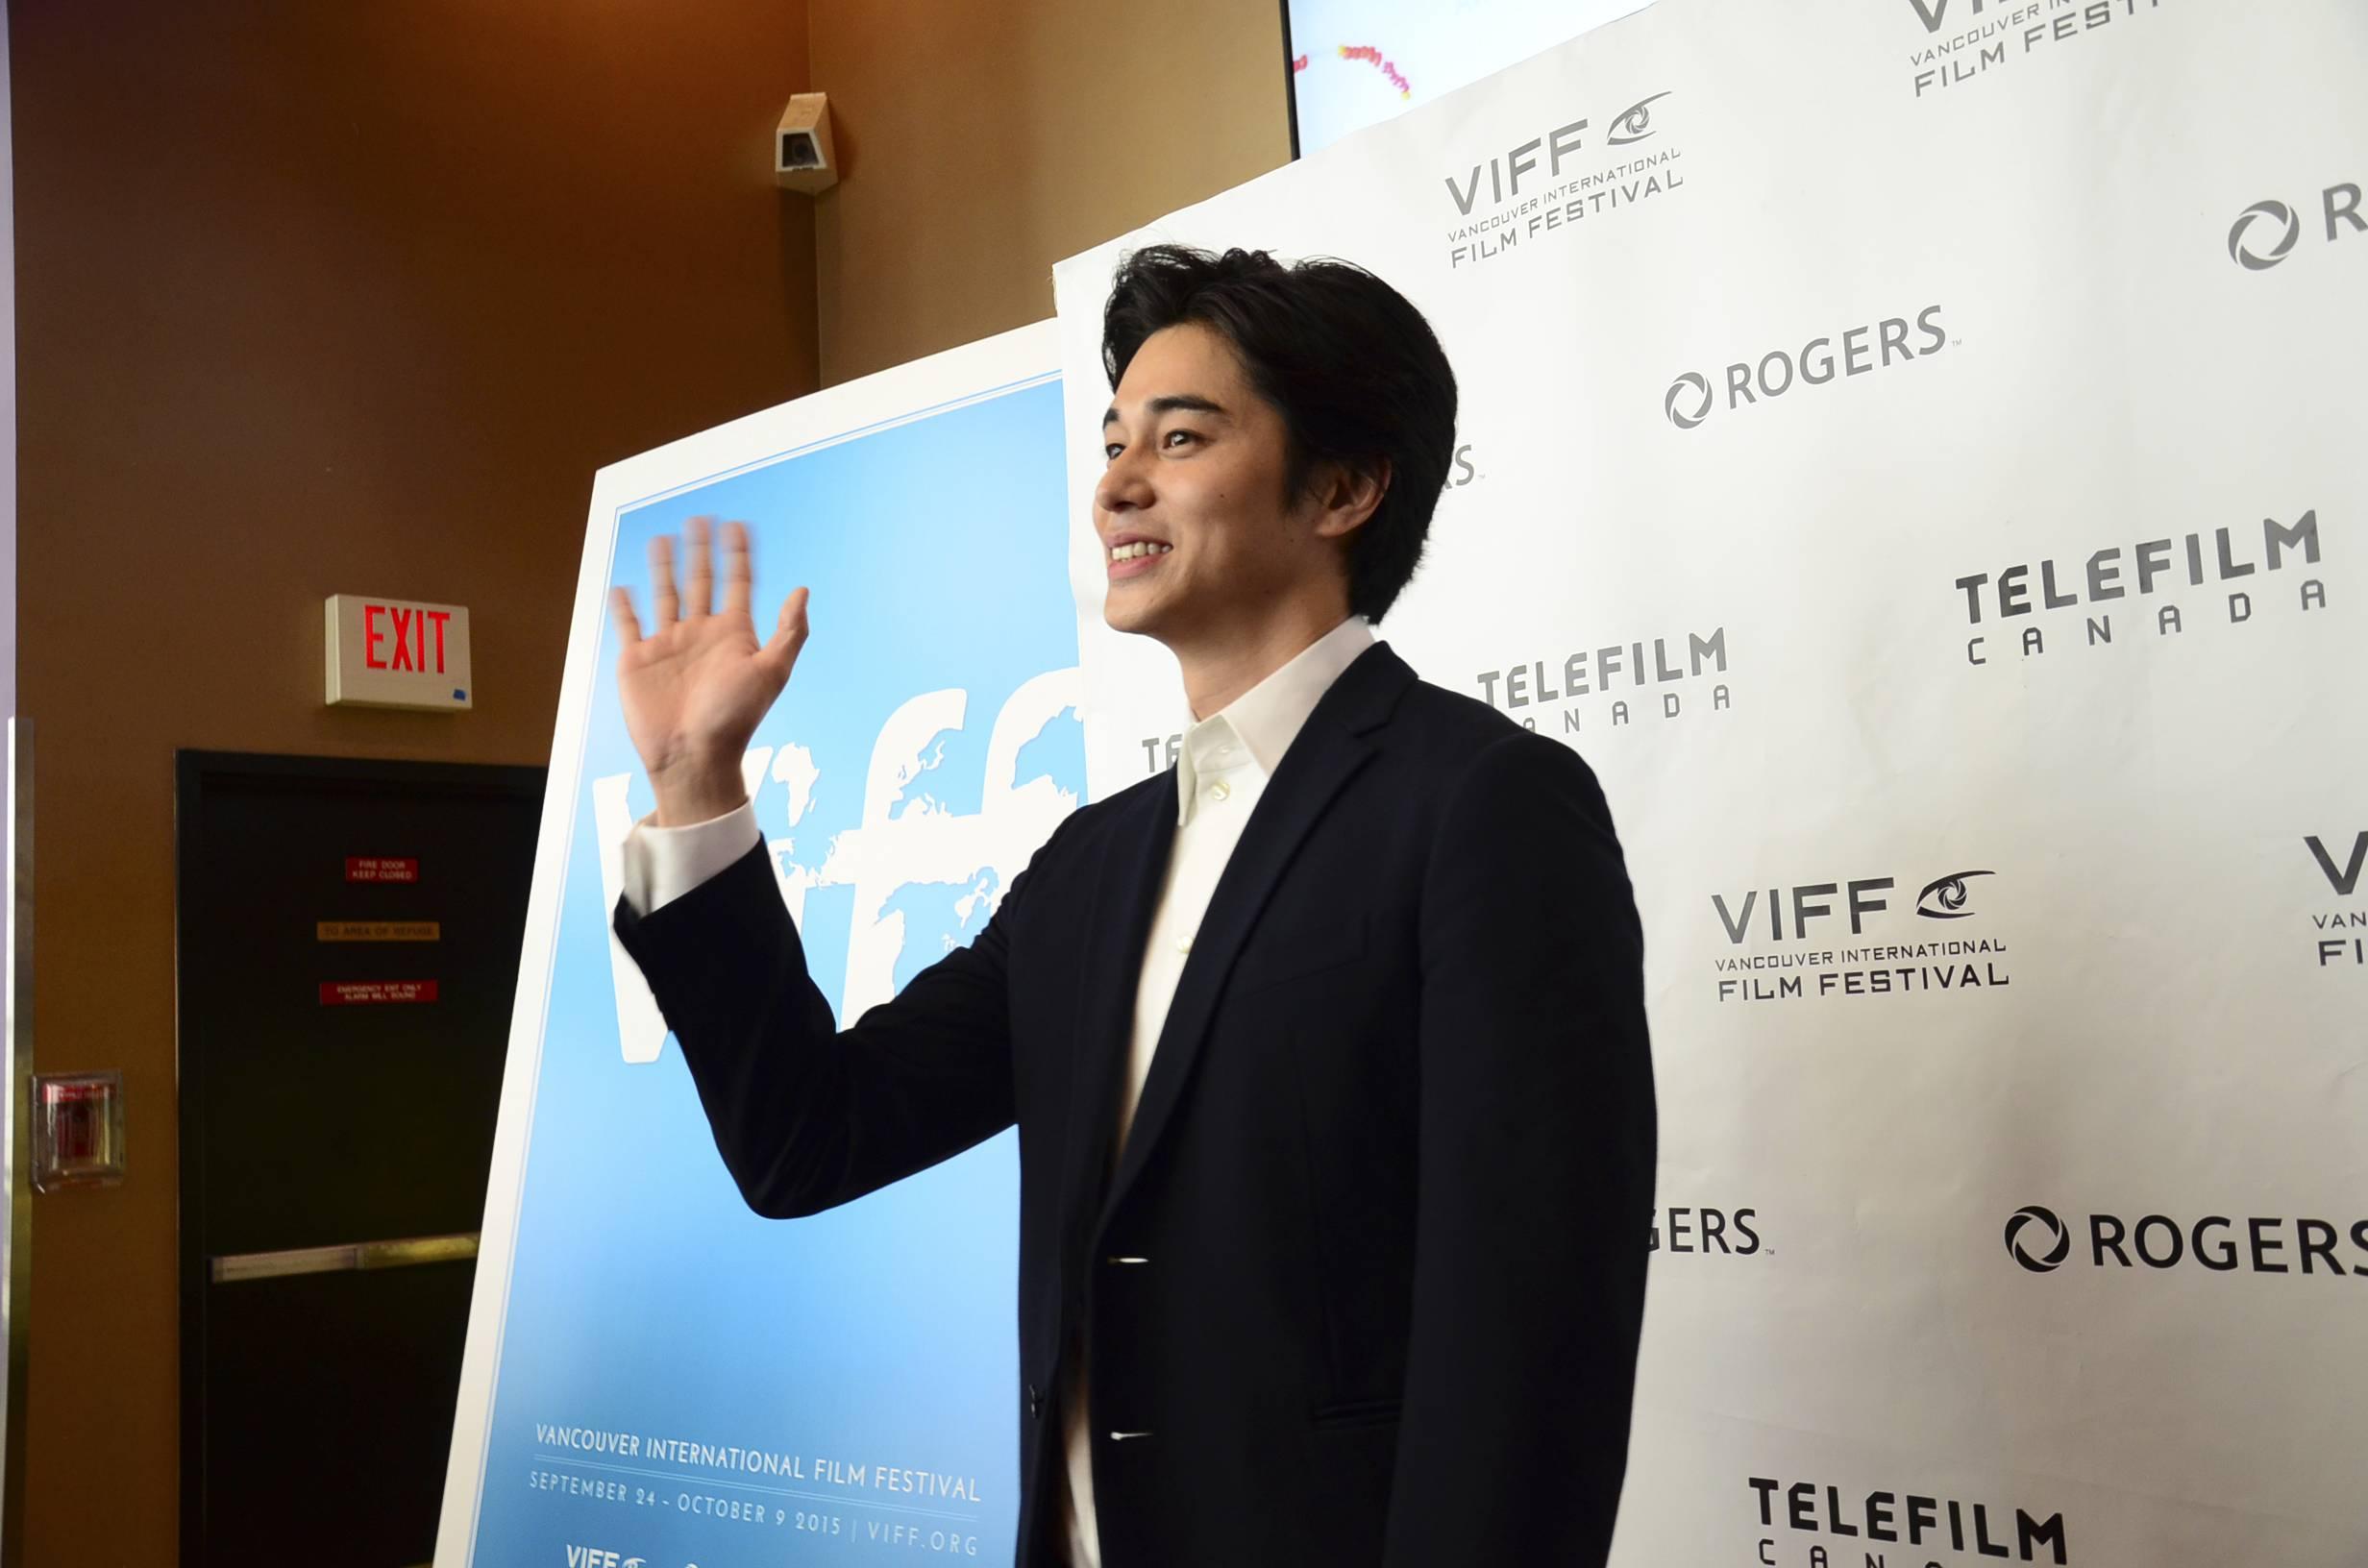 『GONIN サーガ』上映に石井隆監督、東出昌大が登場!【VIFF】